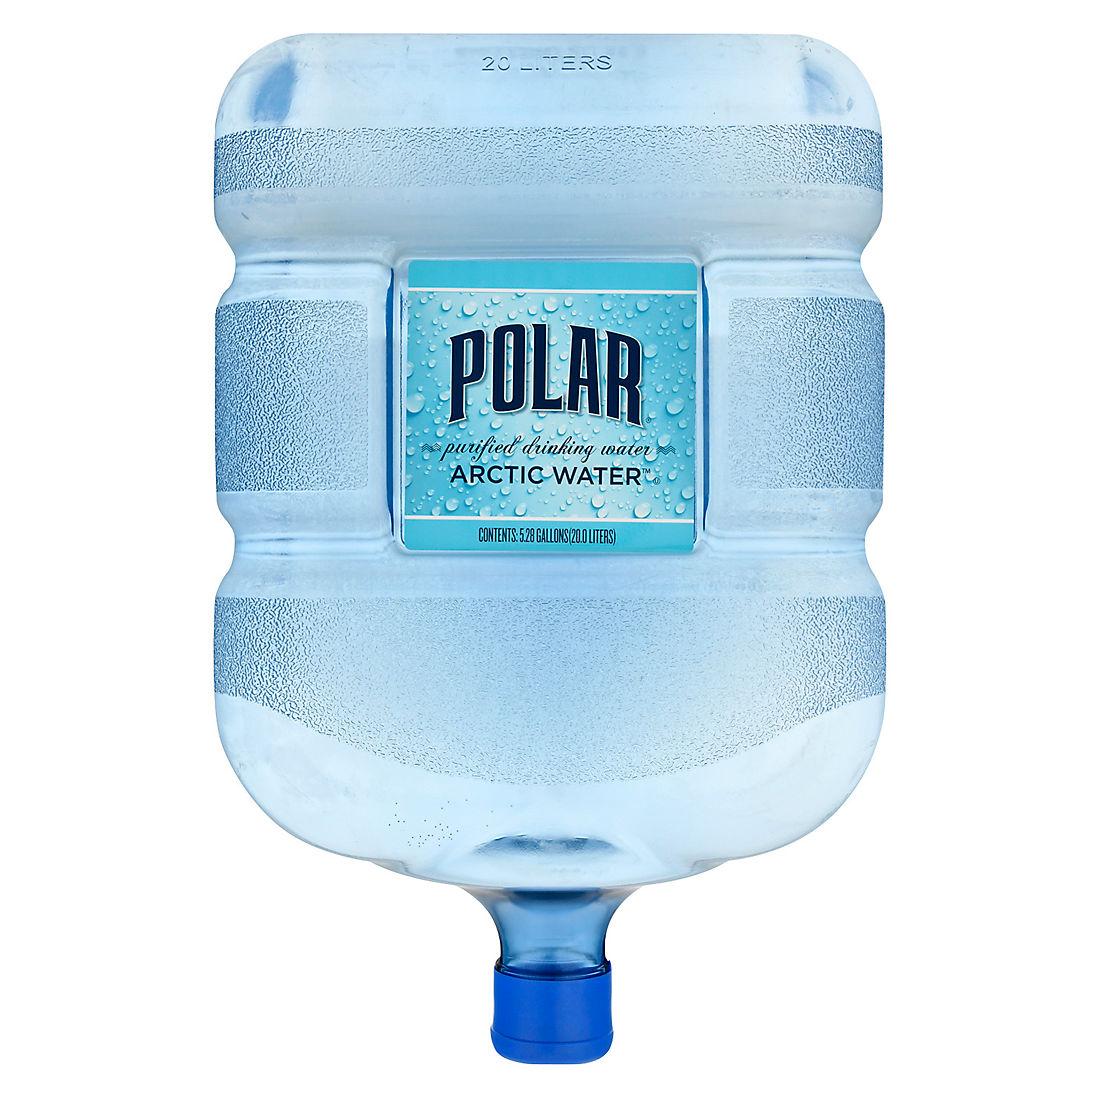 Polar Artic Water, 5 28 gal